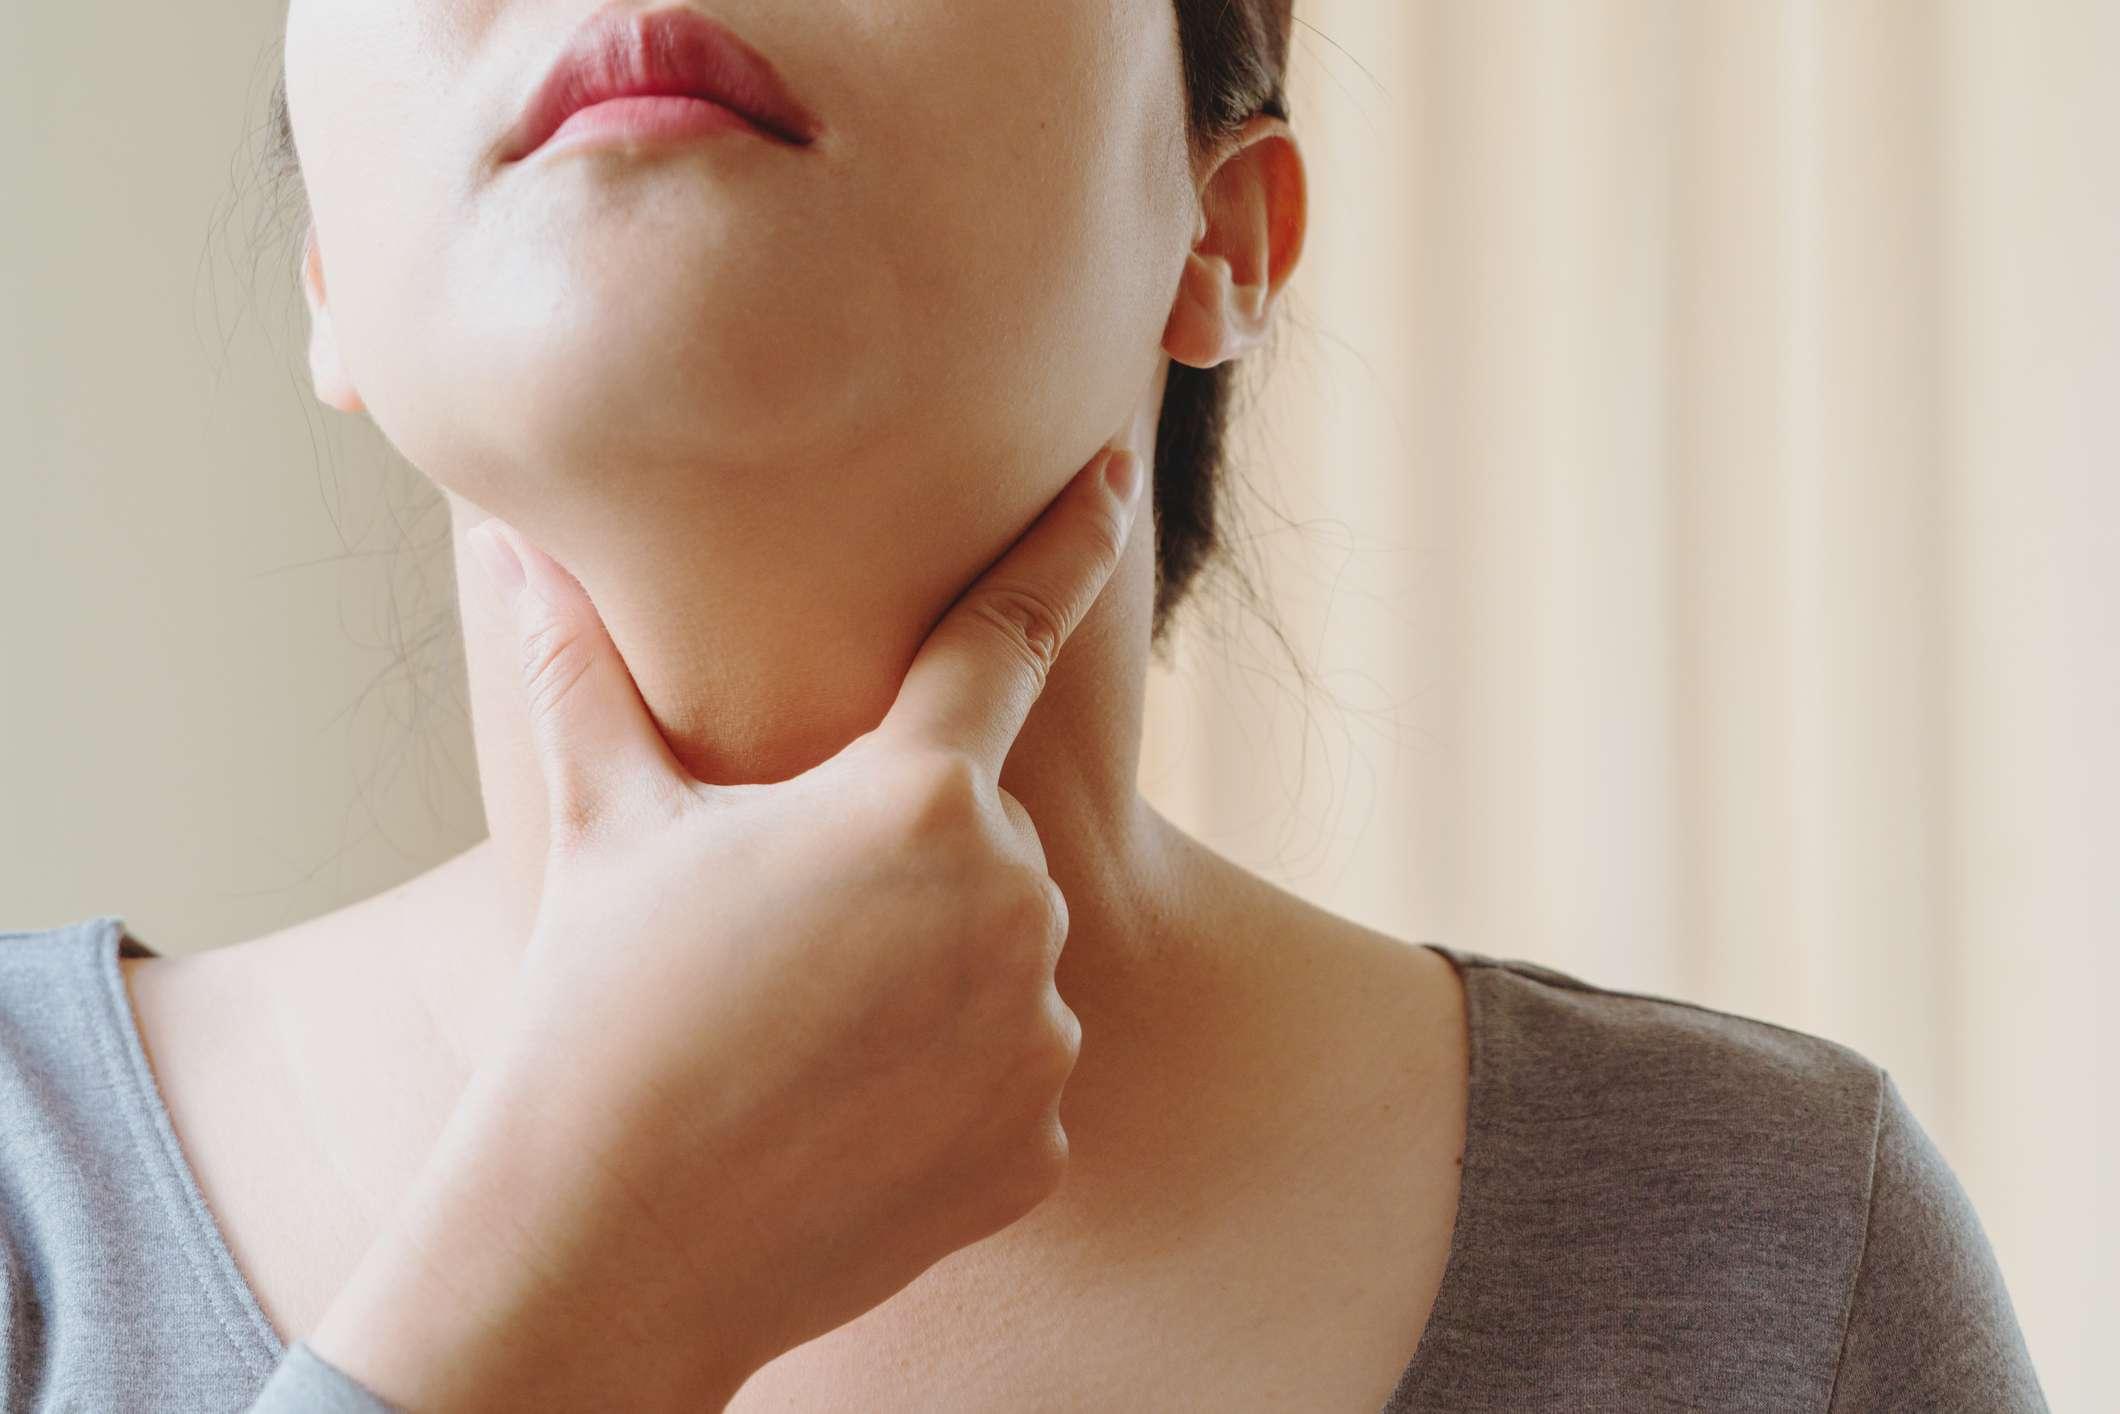 Woman performing a thyroid gland test